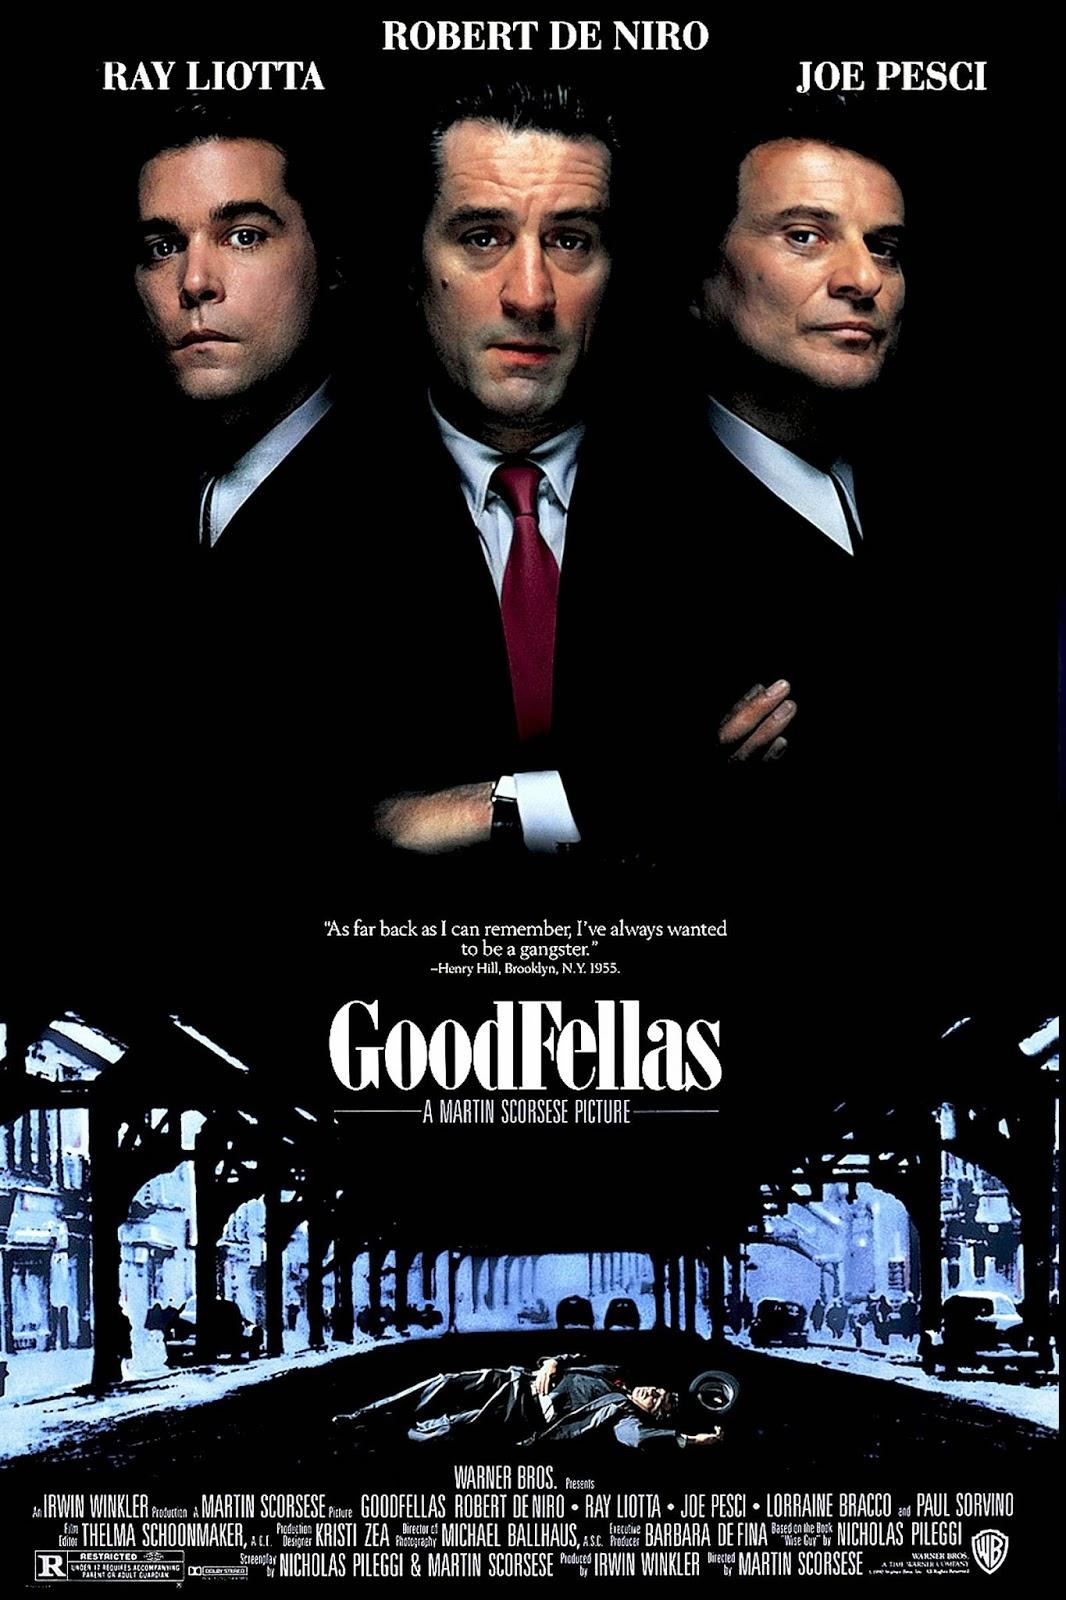 goodfellas full movie part 2 videobash